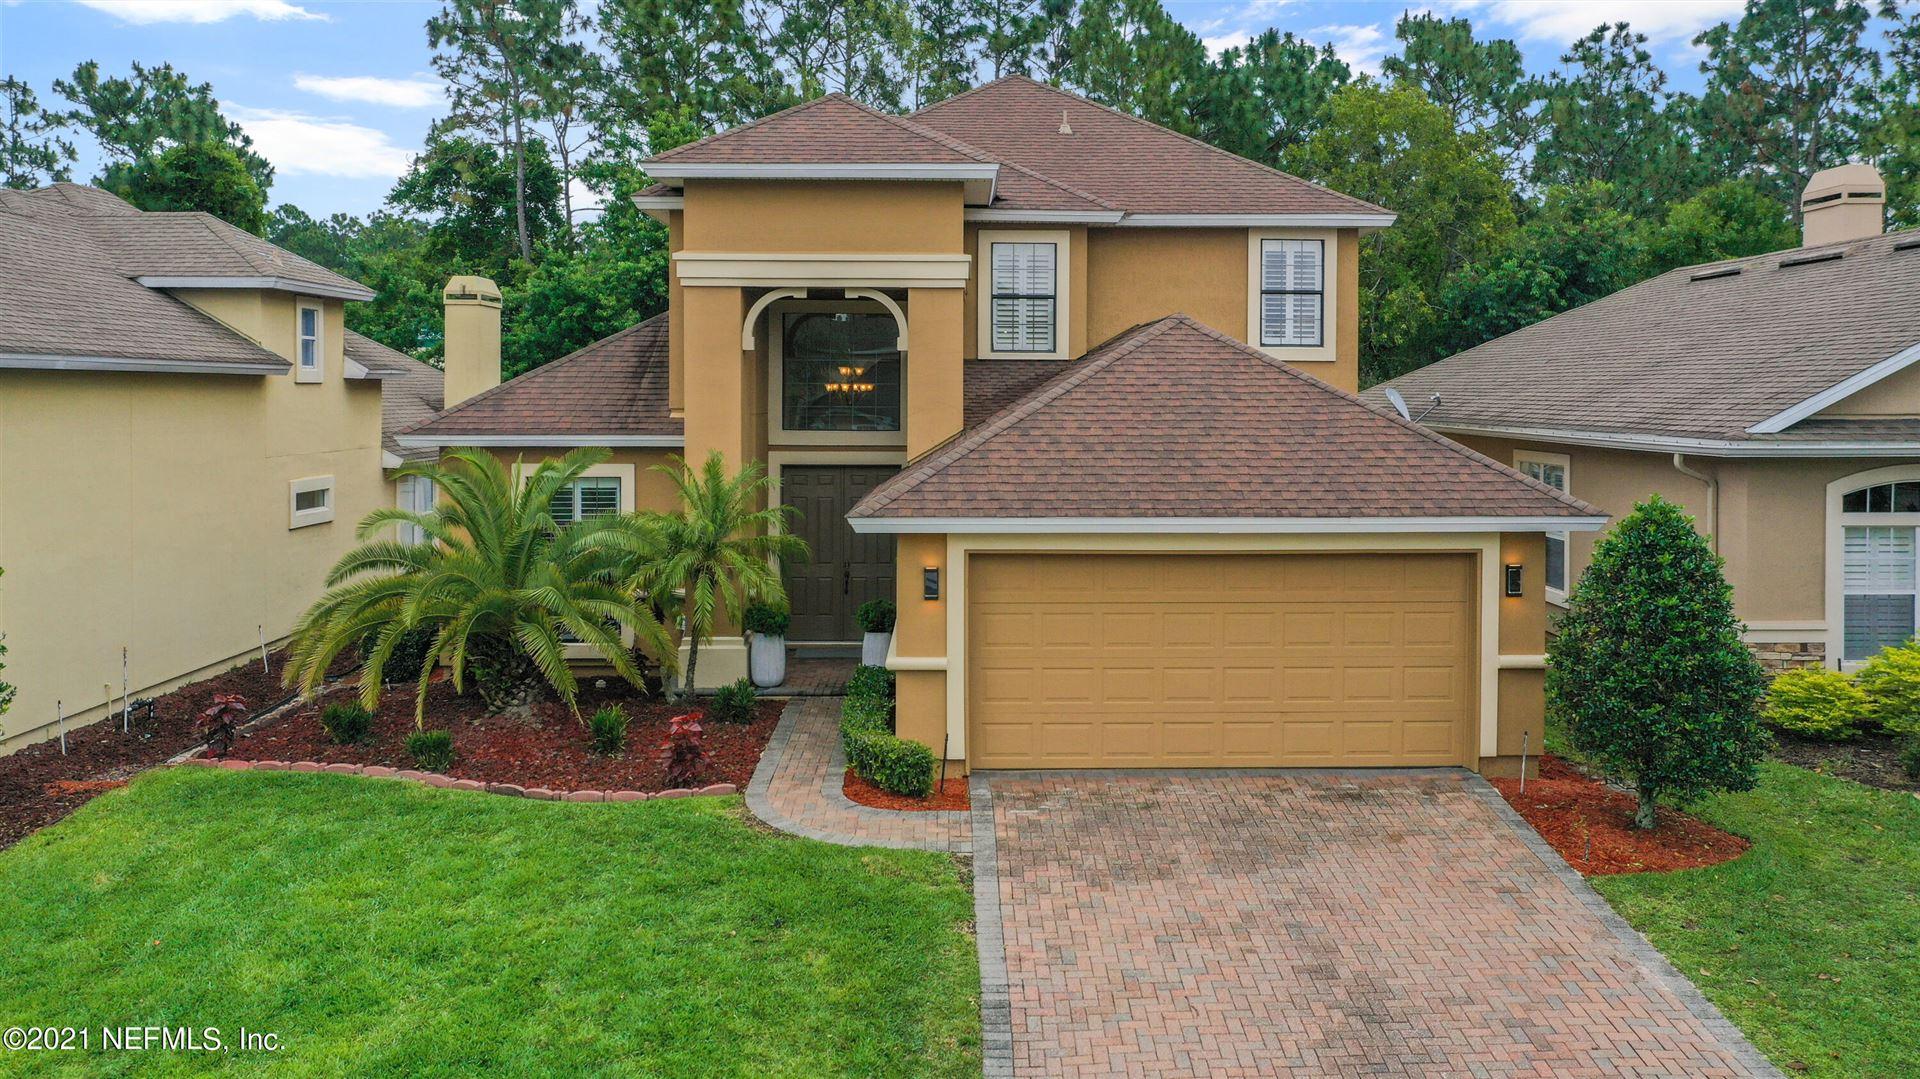 1629 SUMMERDOWN WAY #Lot No: 8, Jacksonville, FL 32259 - MLS#: 1110191